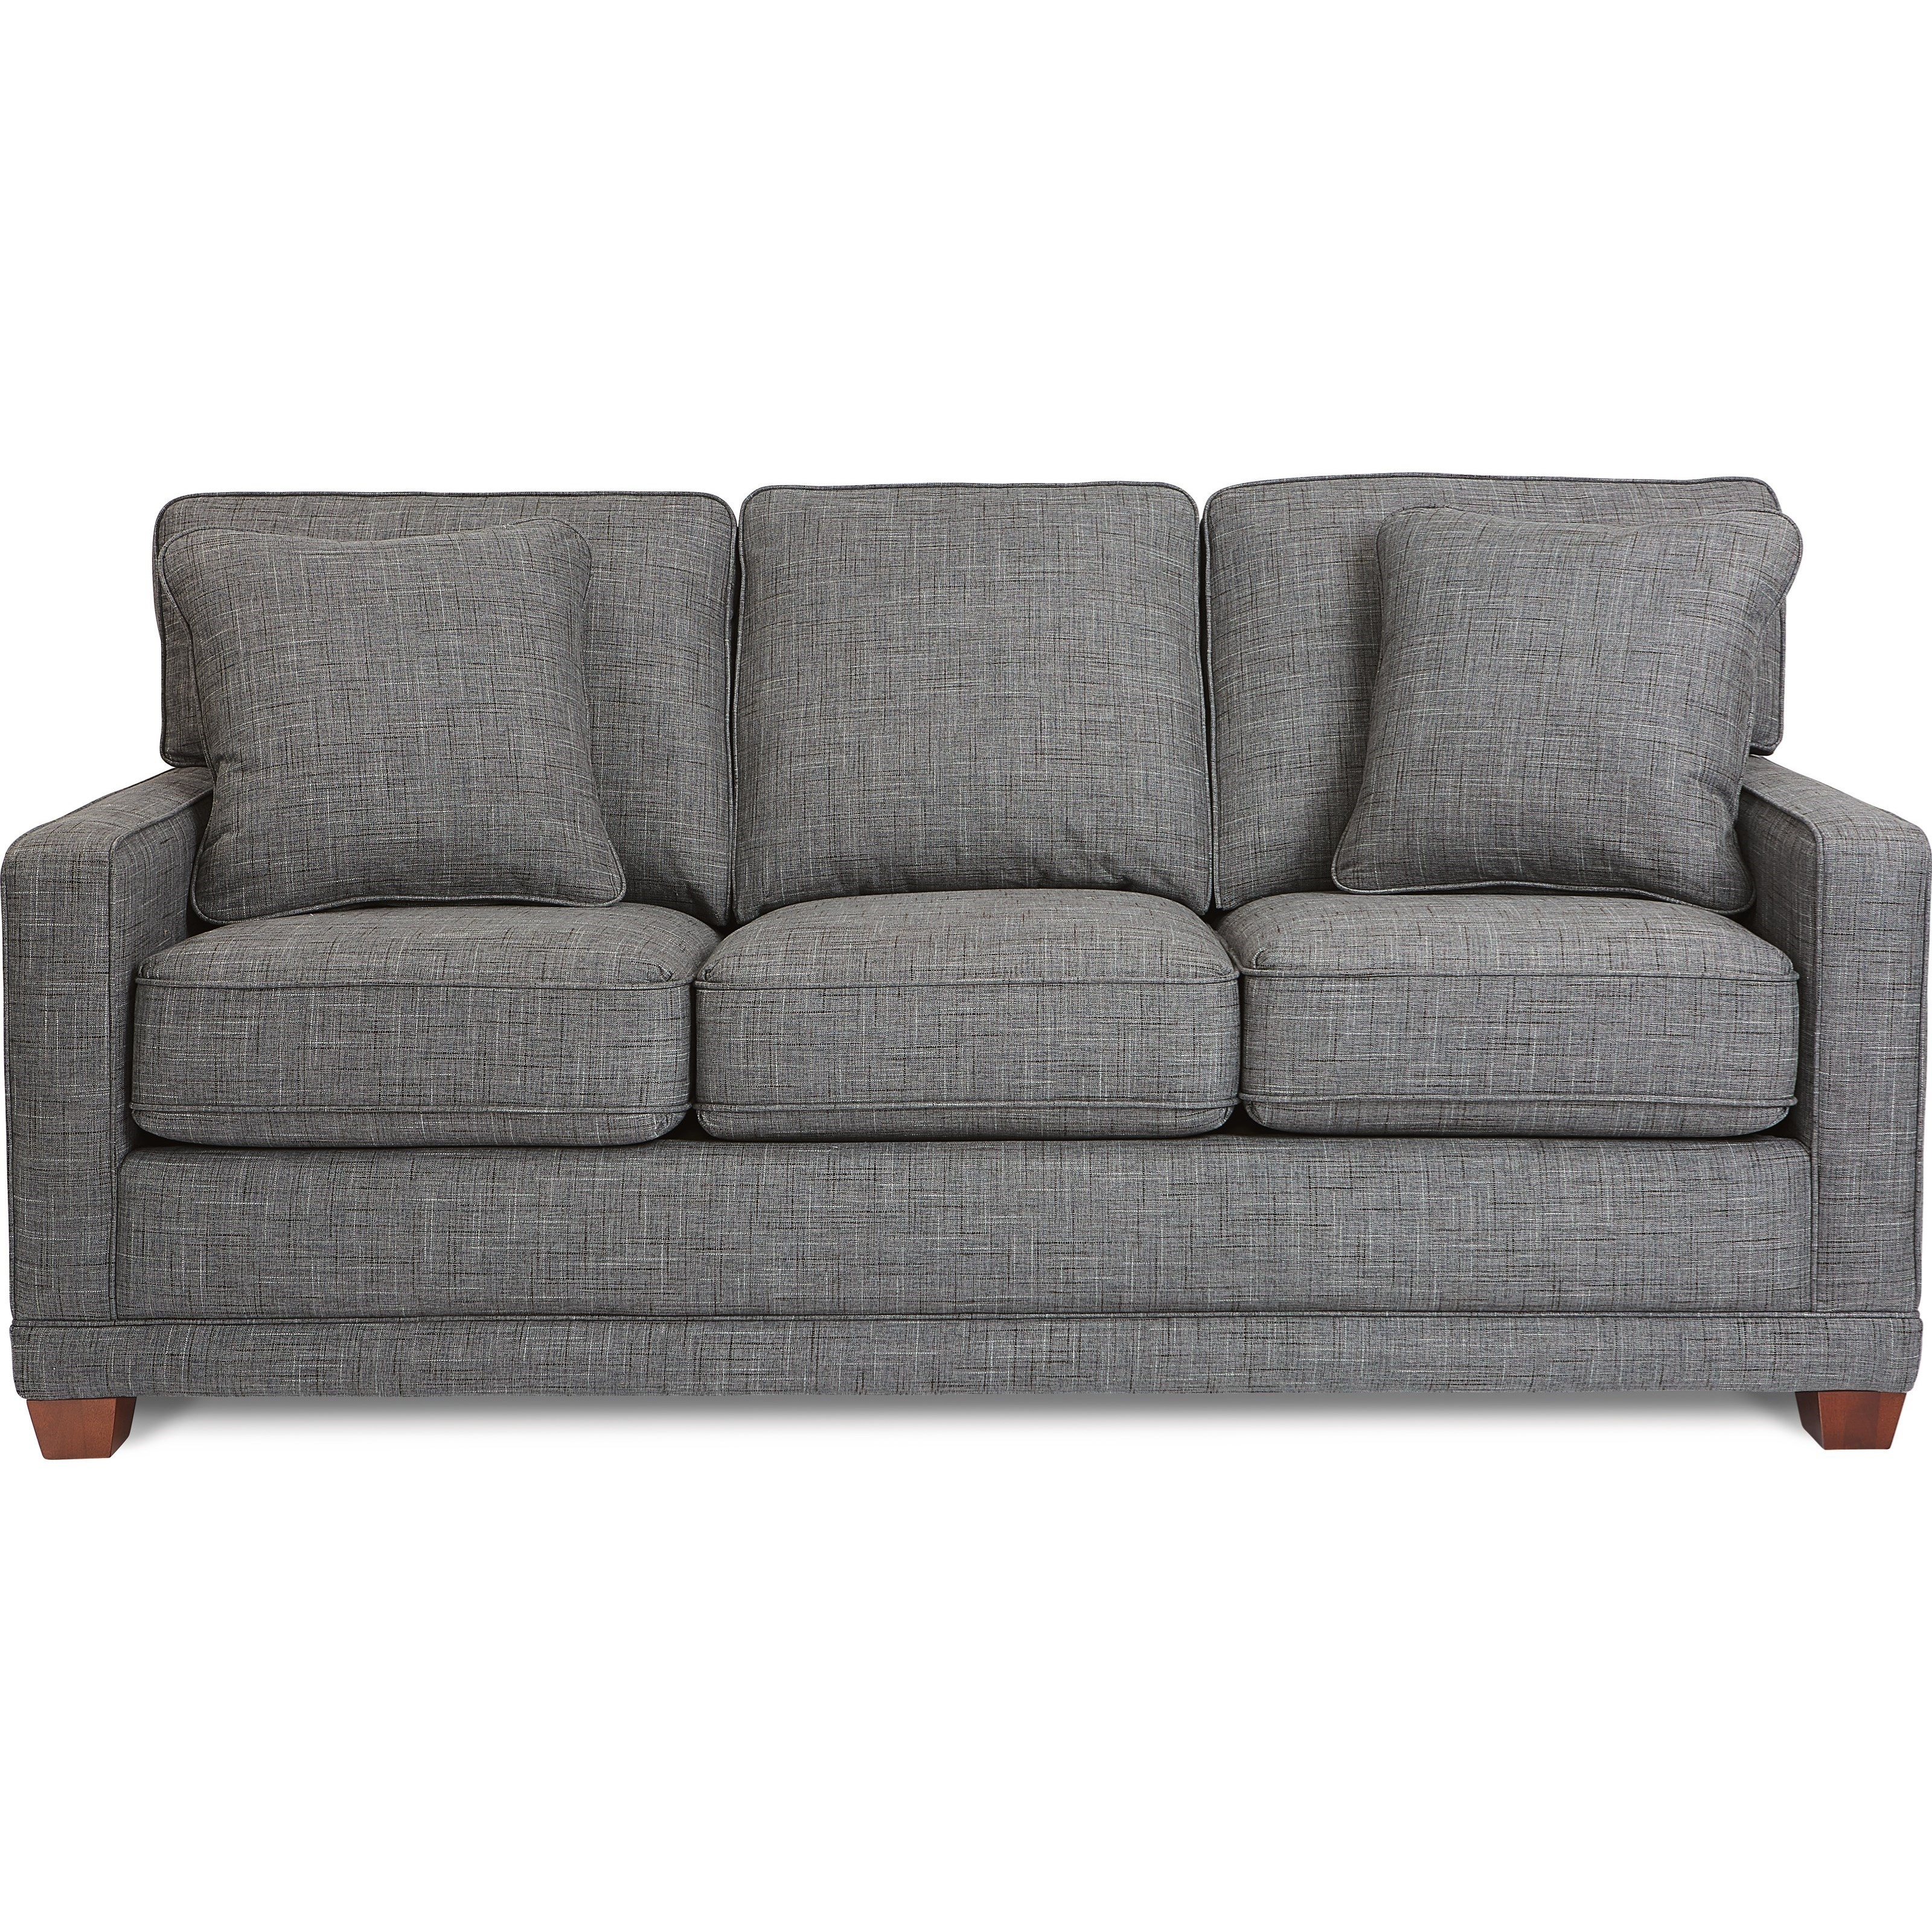 Kennedy Transitional Sofa by La-Z-Boy at Sparks HomeStore